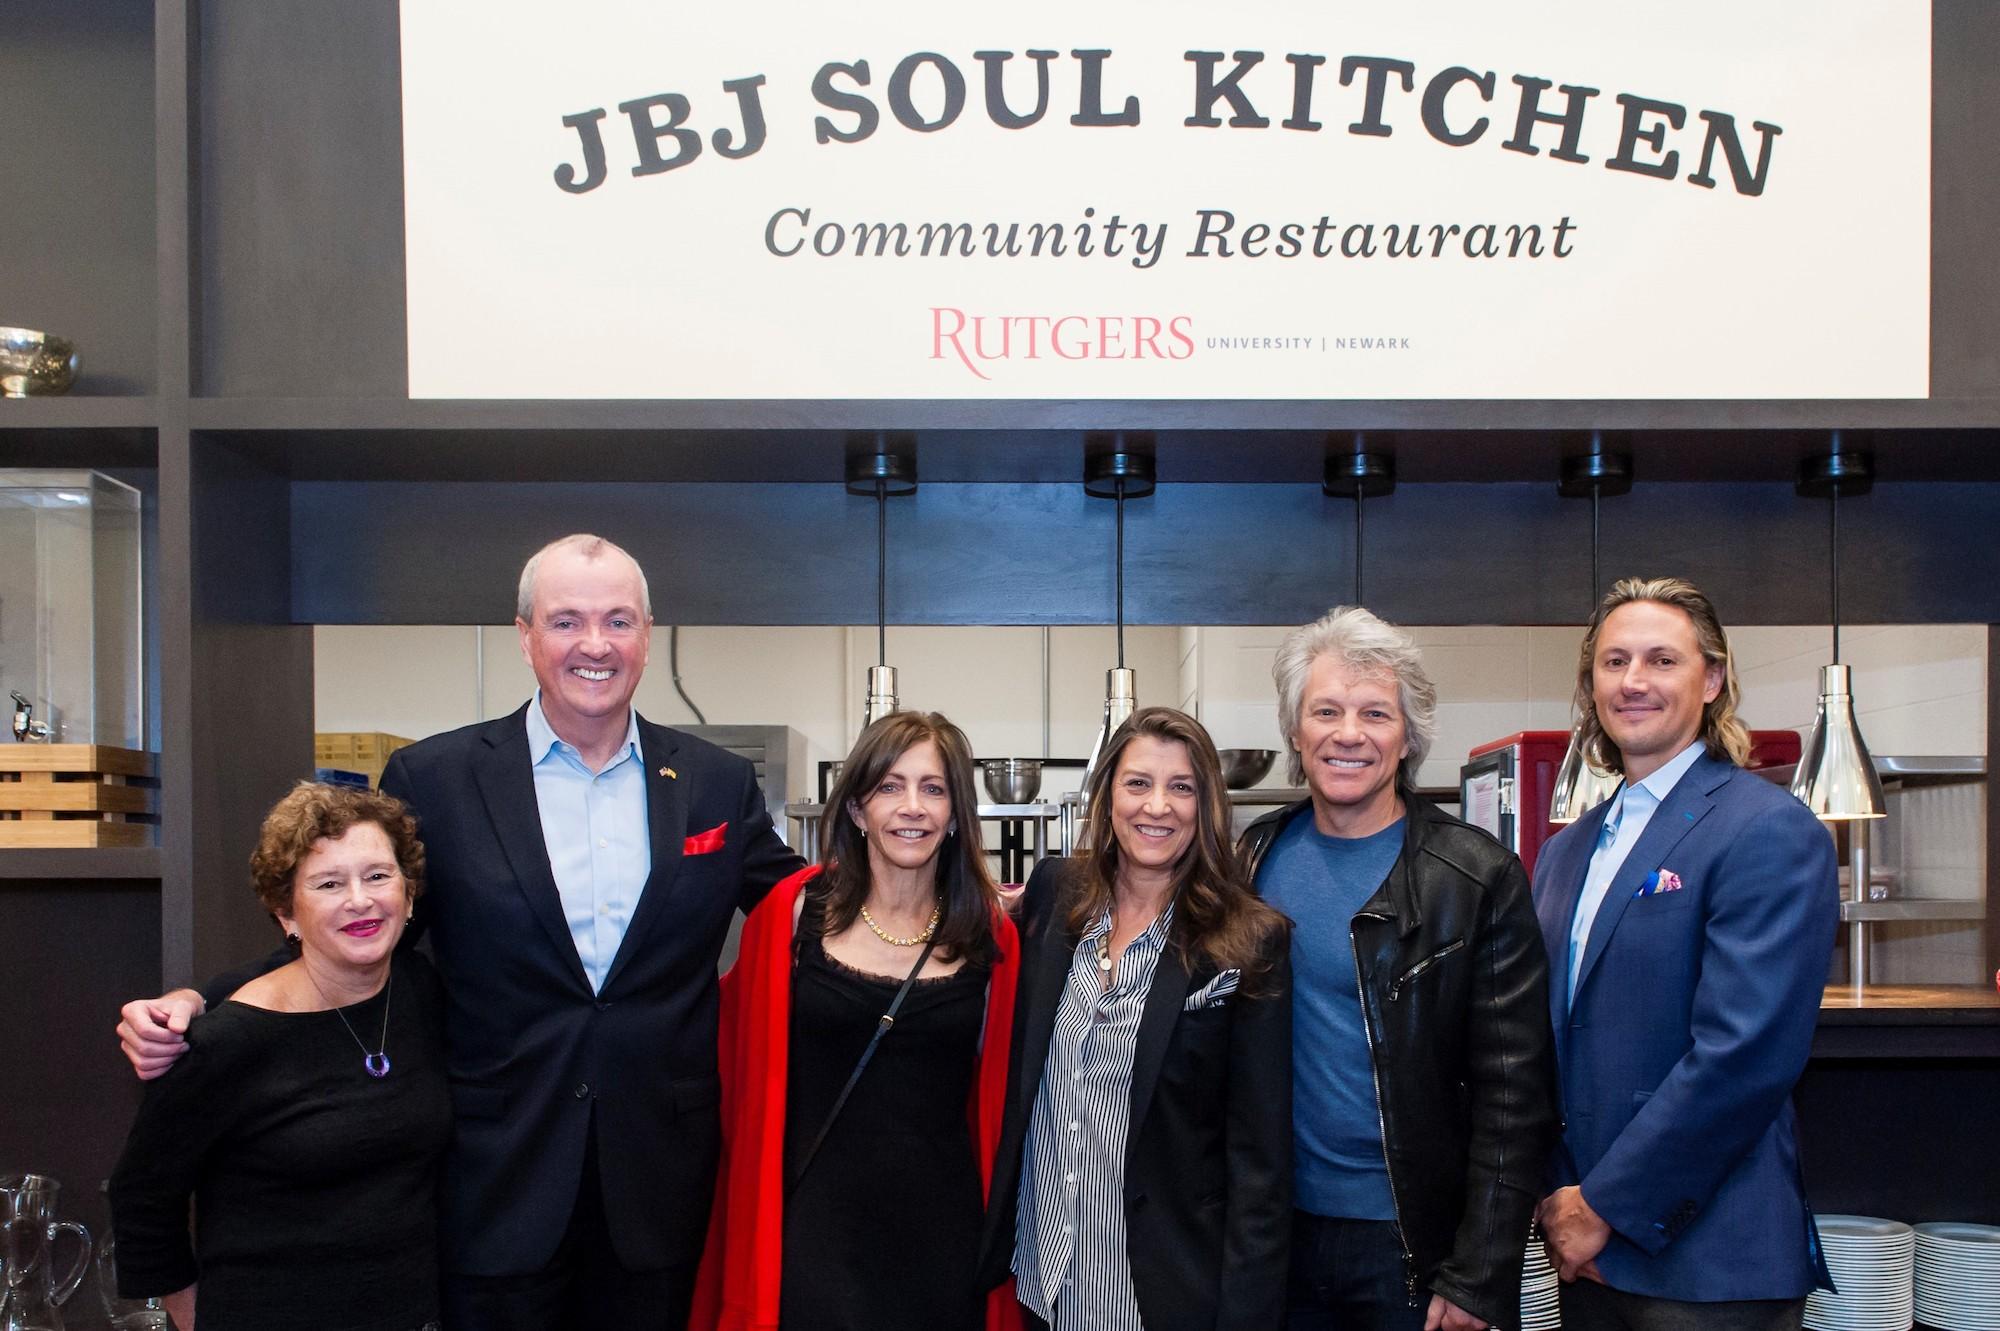 Jon Bon Jovi Soul Kitchen at Rutgers battles student food insecurity | Food Management